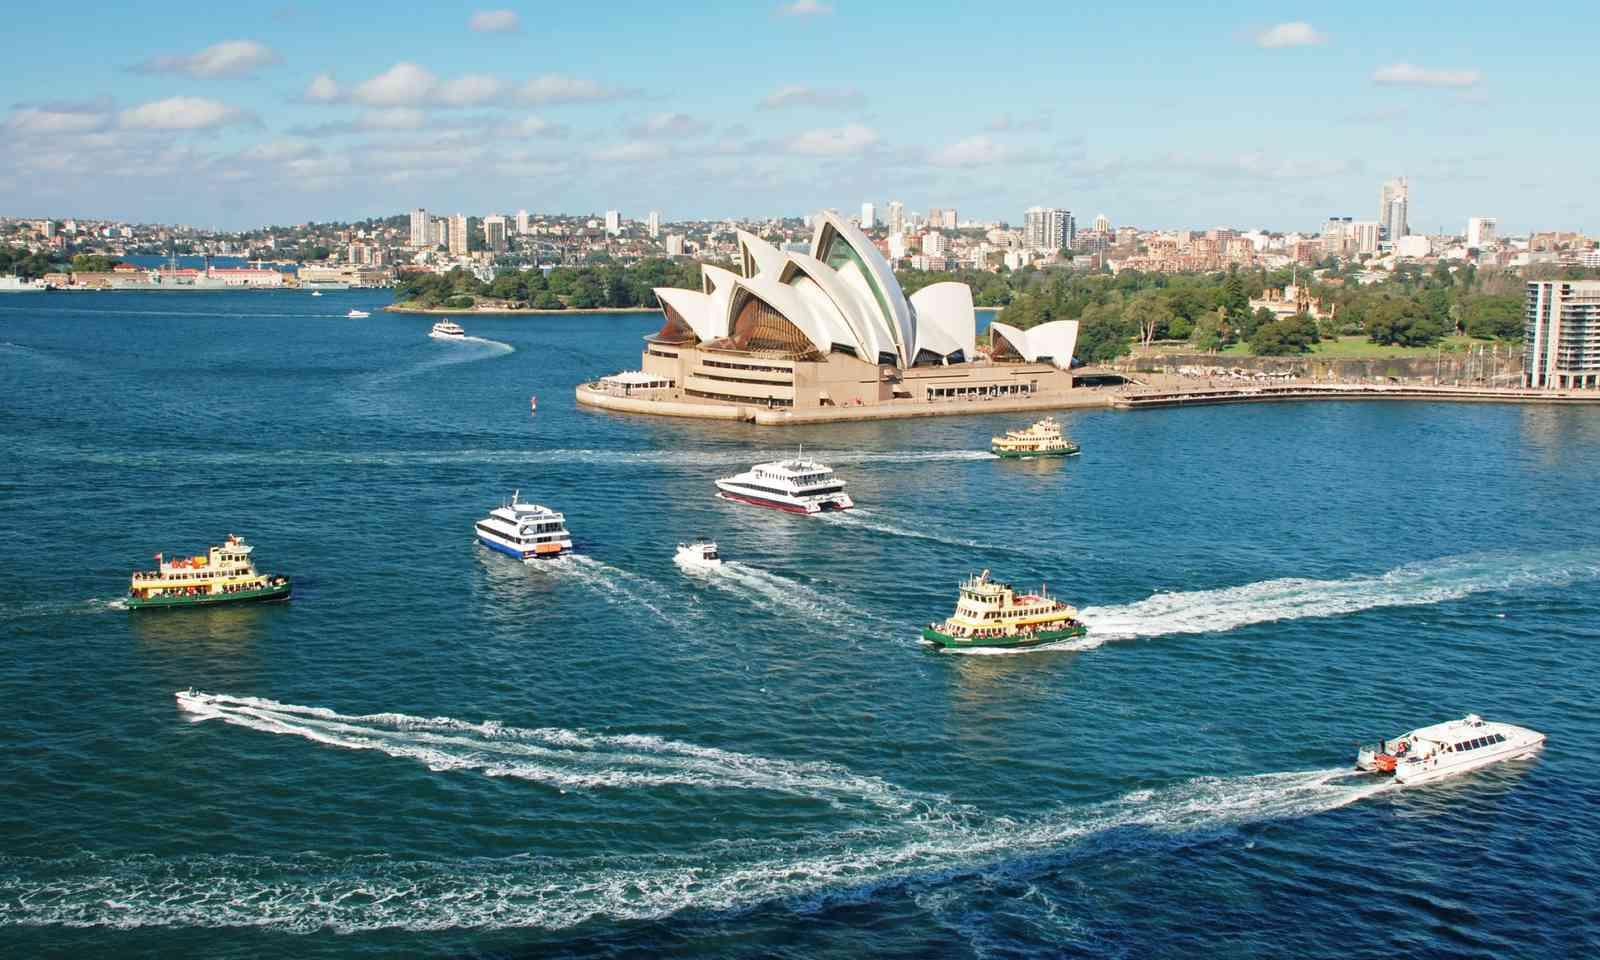 The Sydney Opera House (Dreamstime)